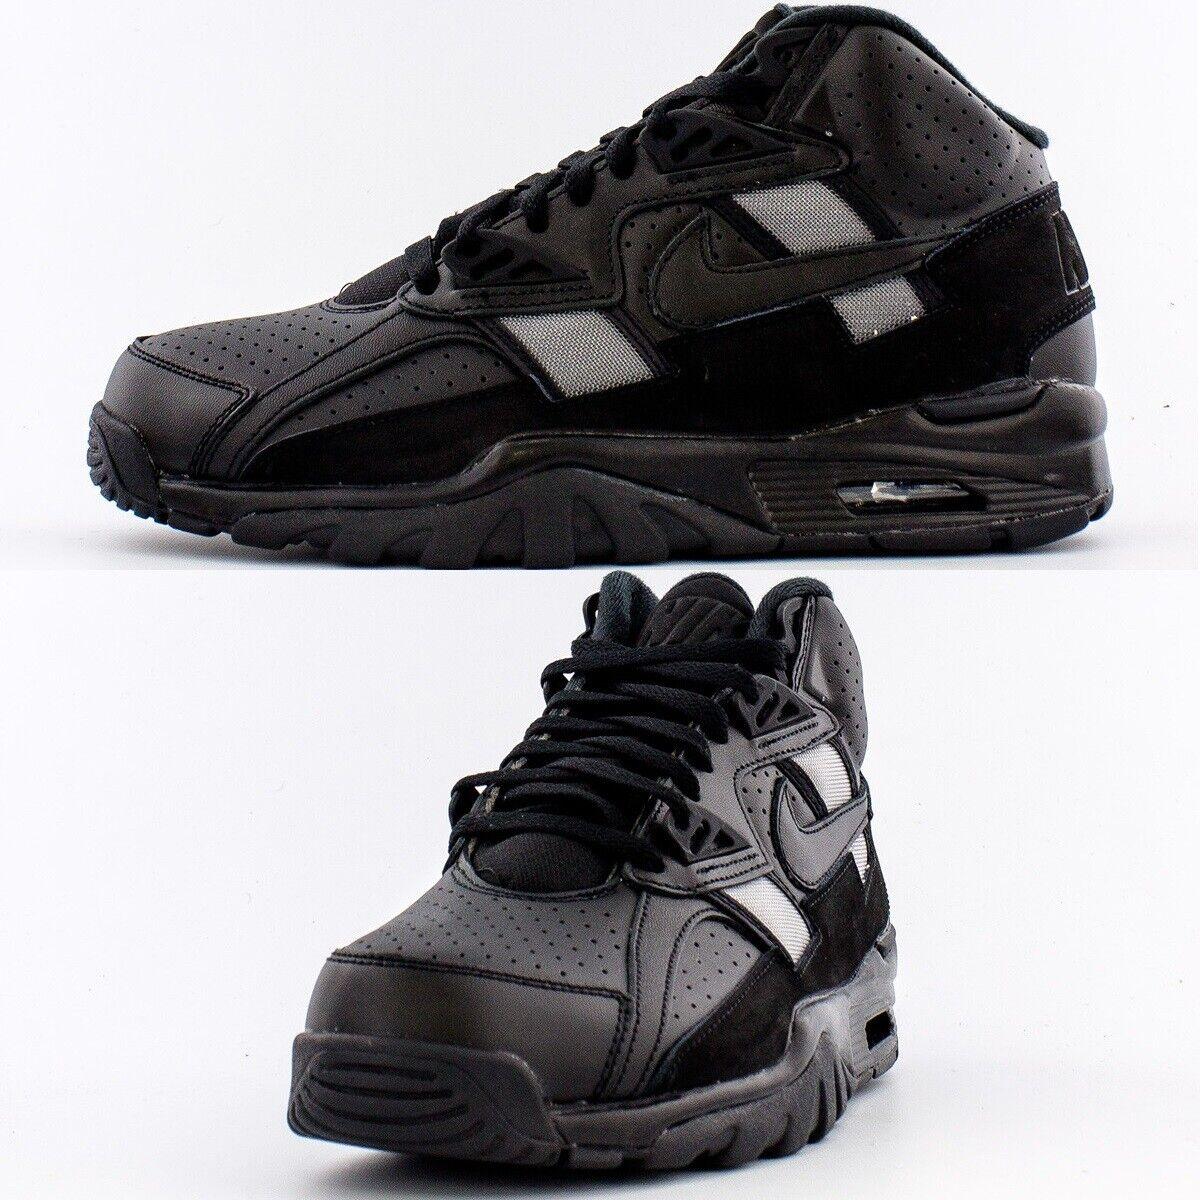 all bo jackson shoes